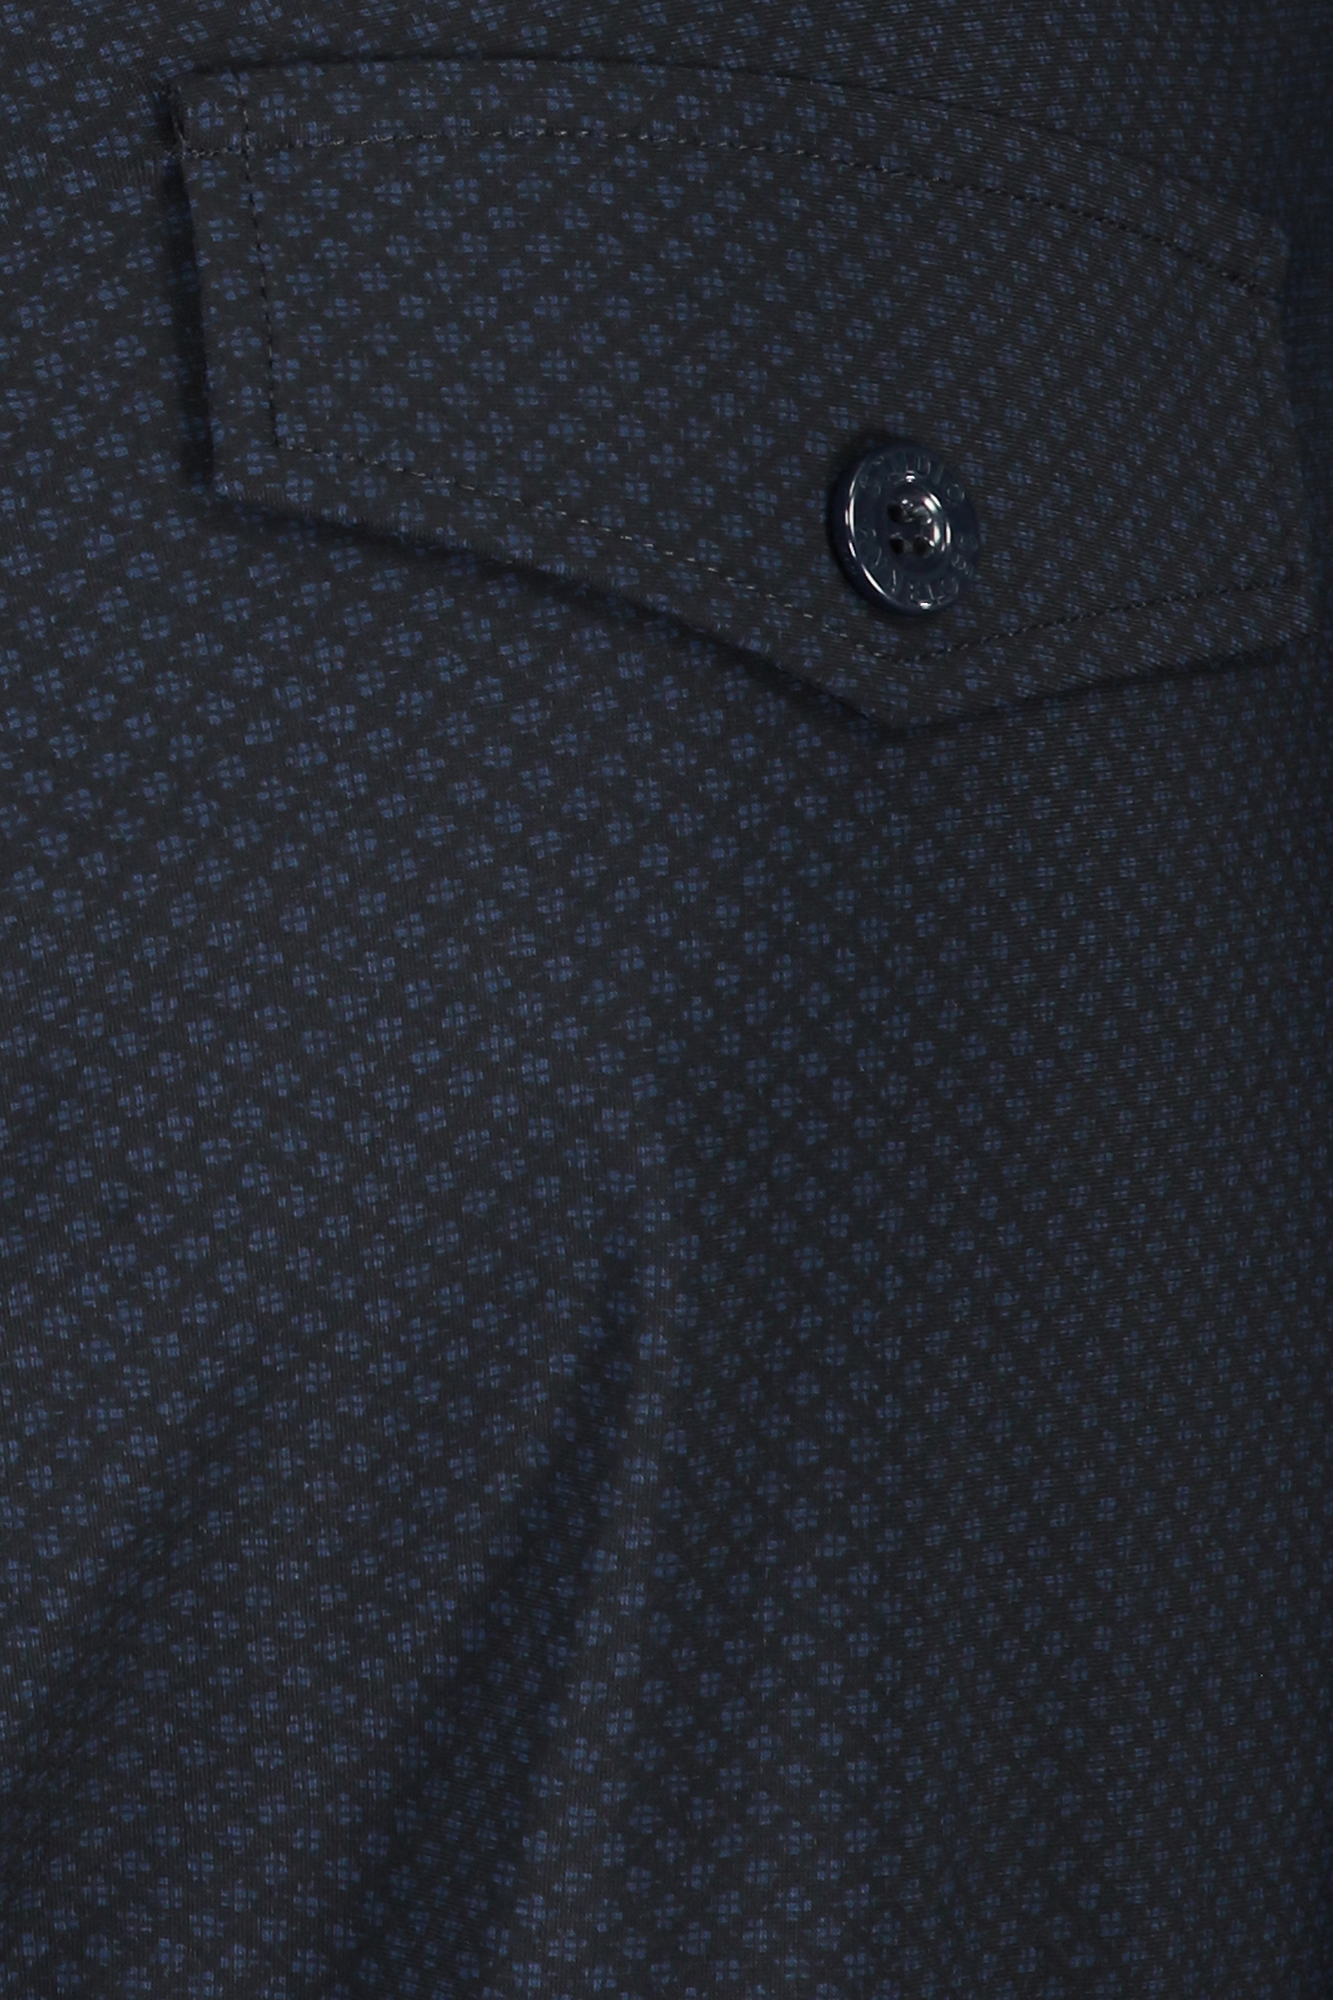 Road cravat trousers